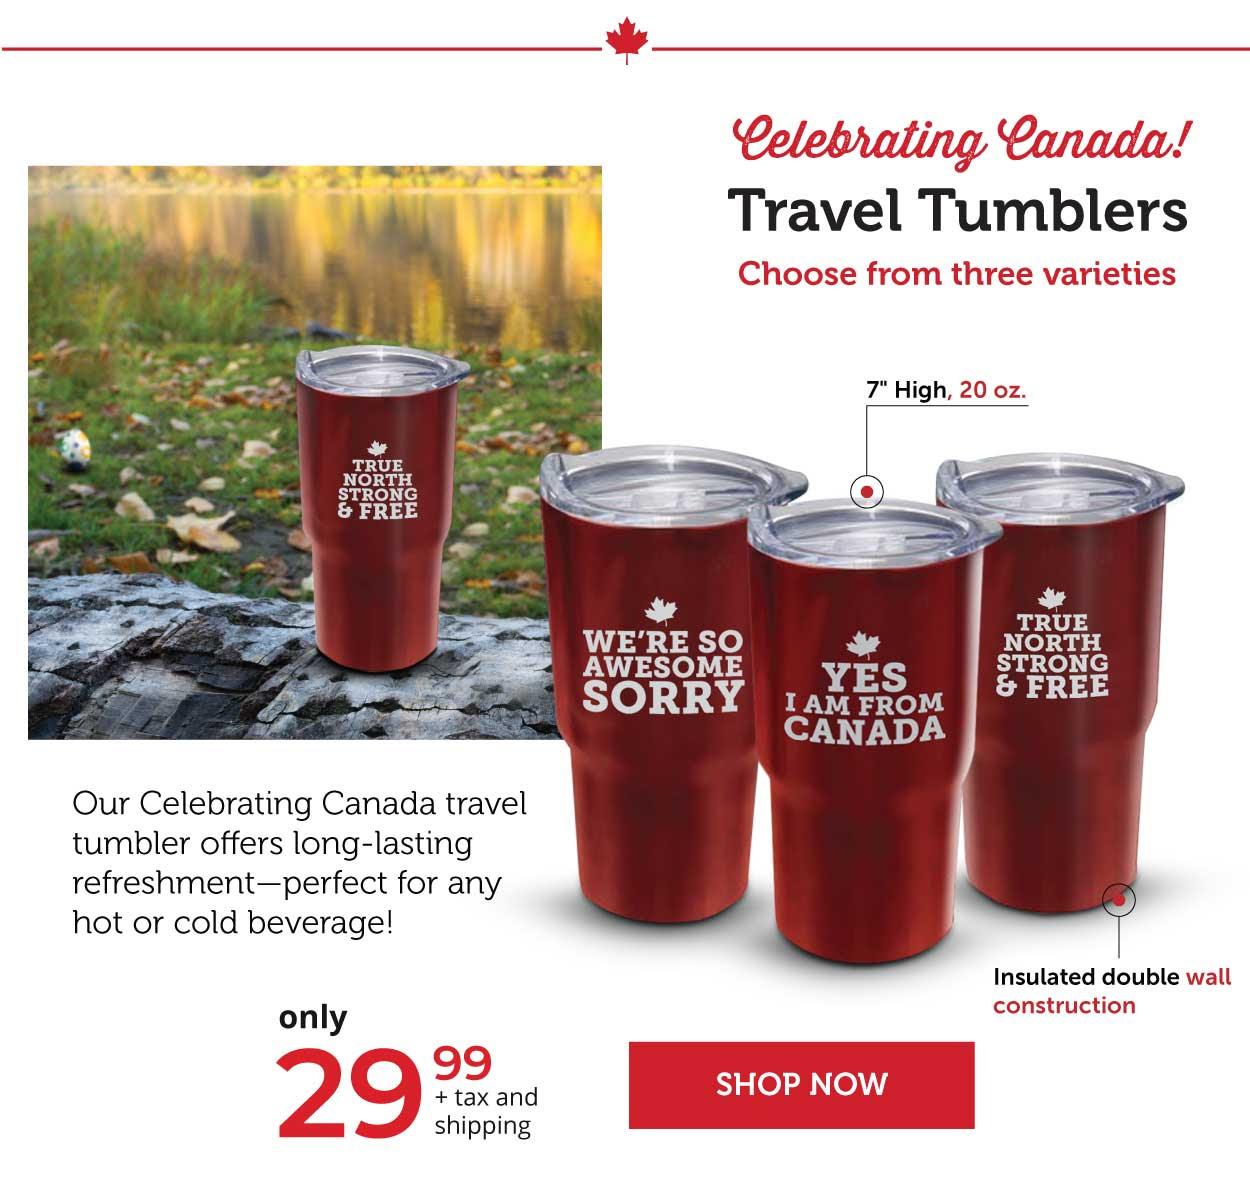 Celebrating Canada Travel Tumblers